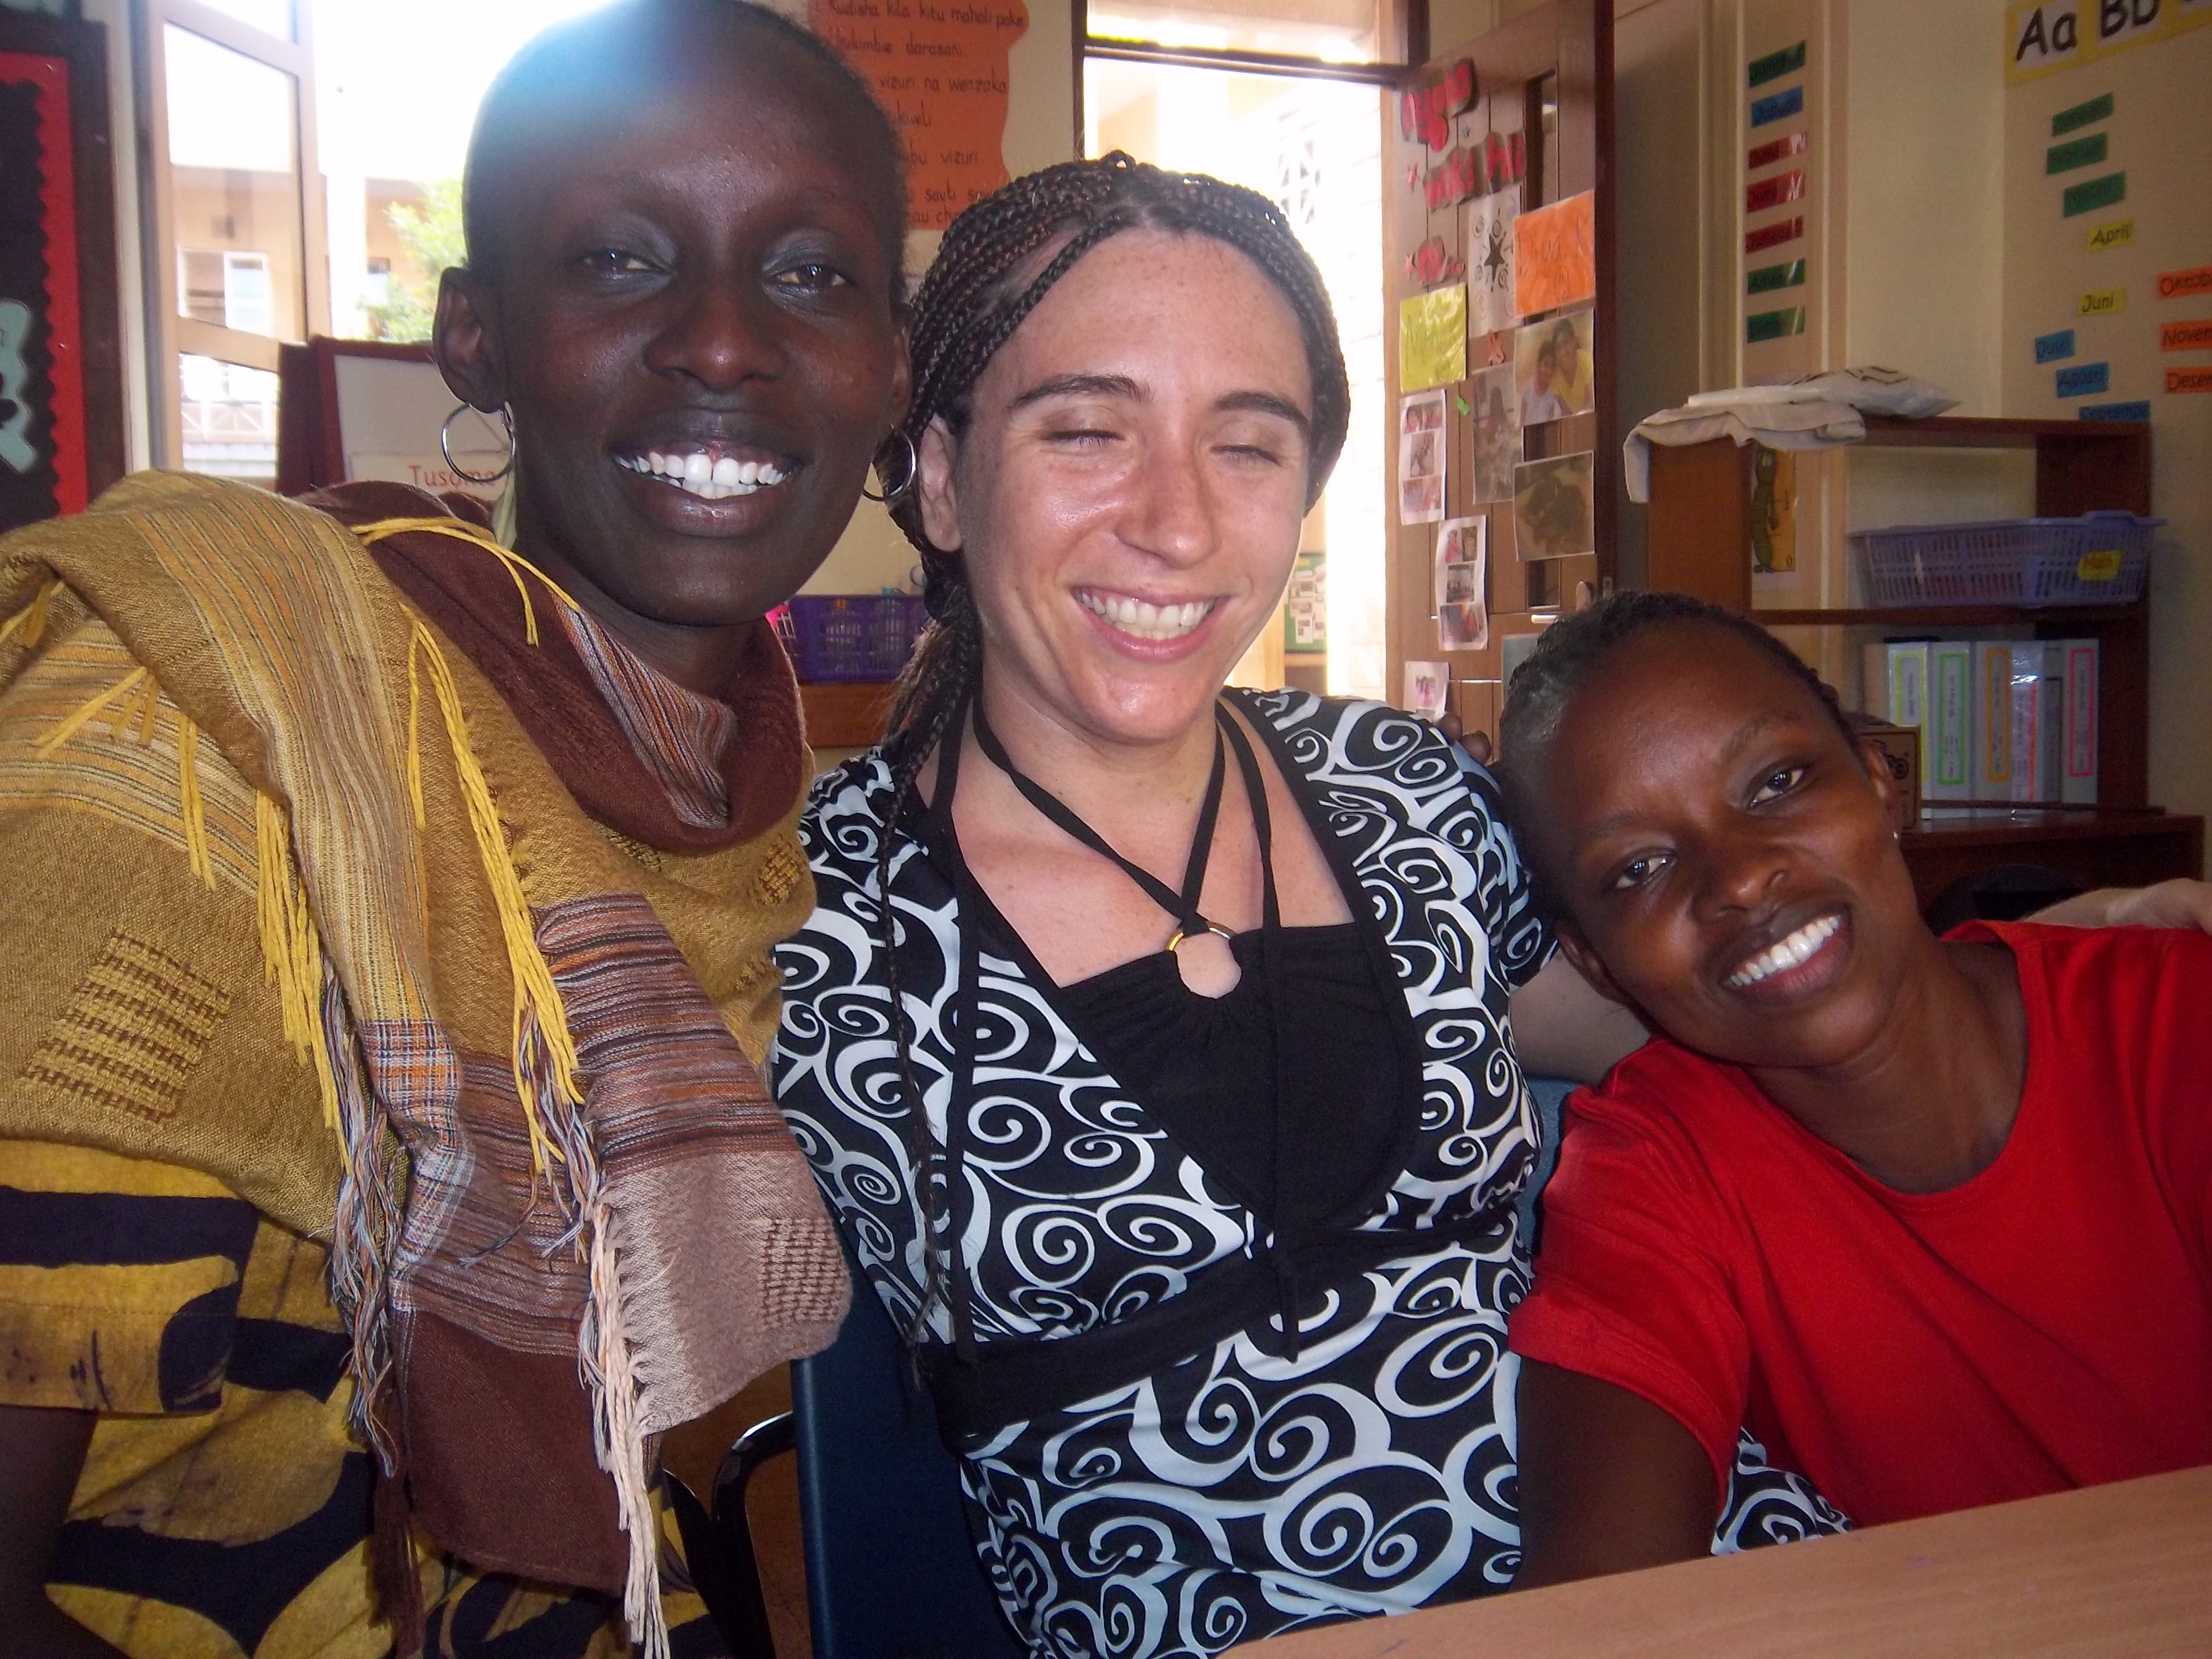 Mzungu: Kenyans say, white skin human heart - The Race